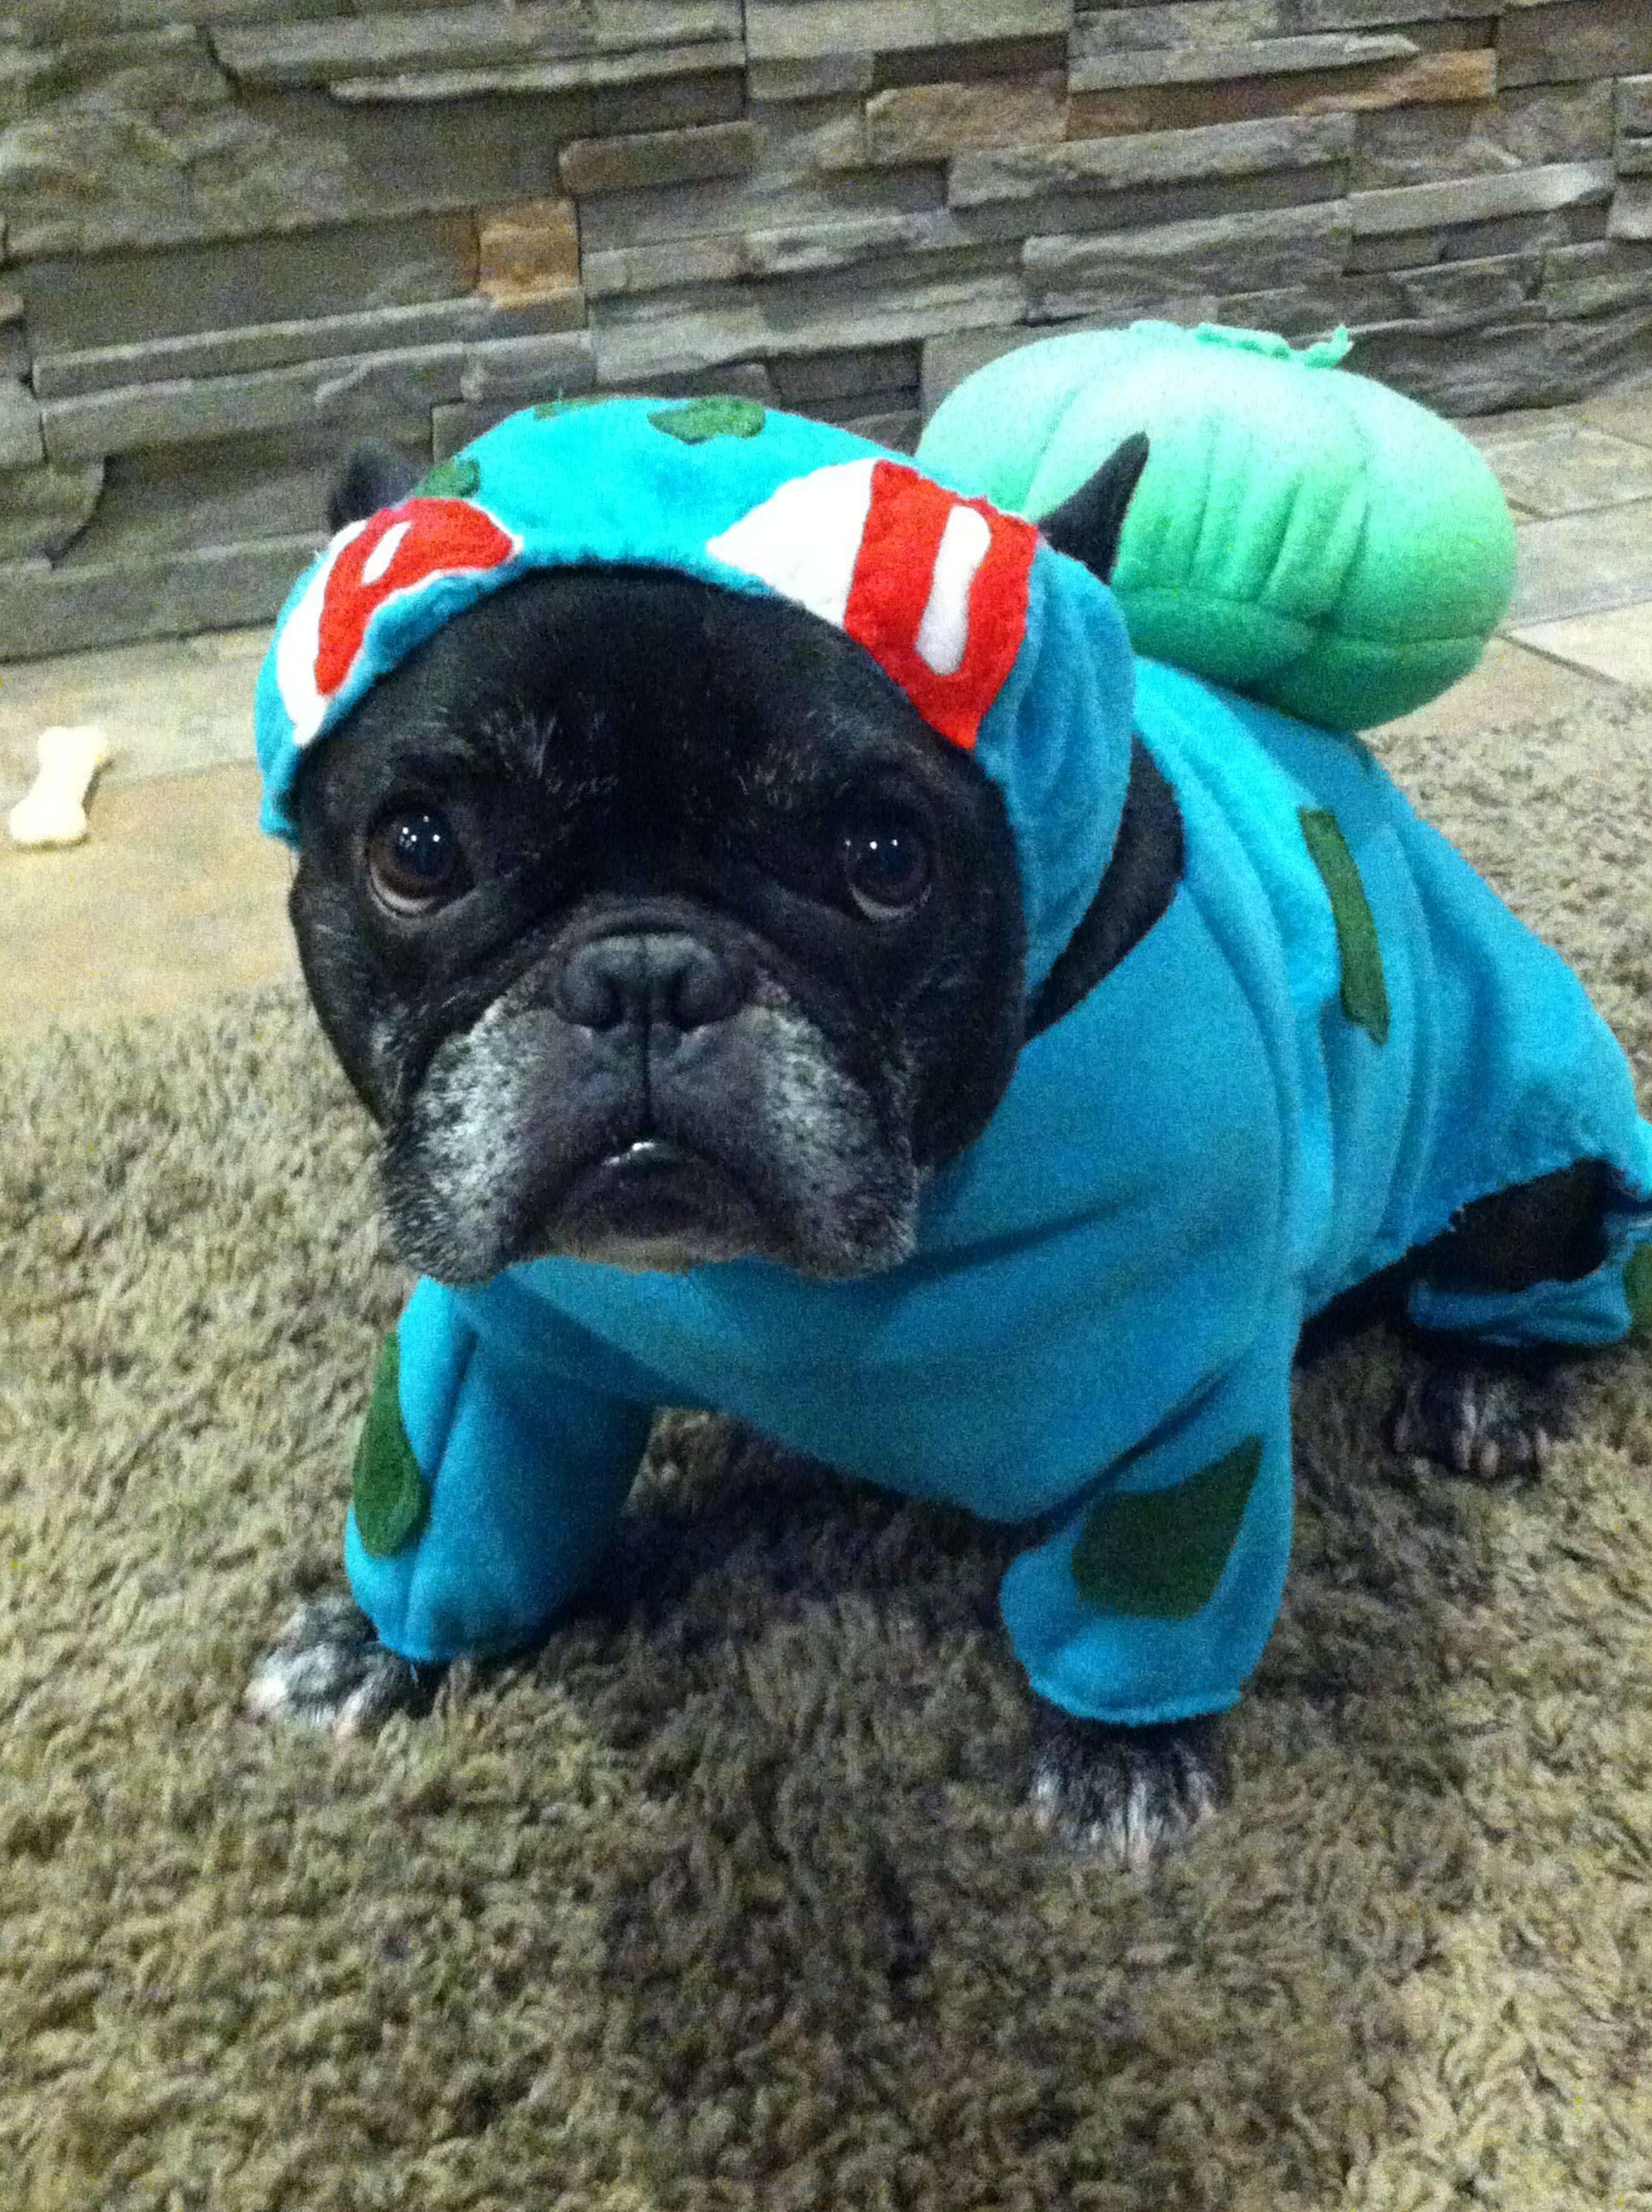 French Bulldog Bulldog Pug Costume Cat Puppy dog dog like mammal dog breed pug snout & Image - 634033] | Halloween | Know Your Meme